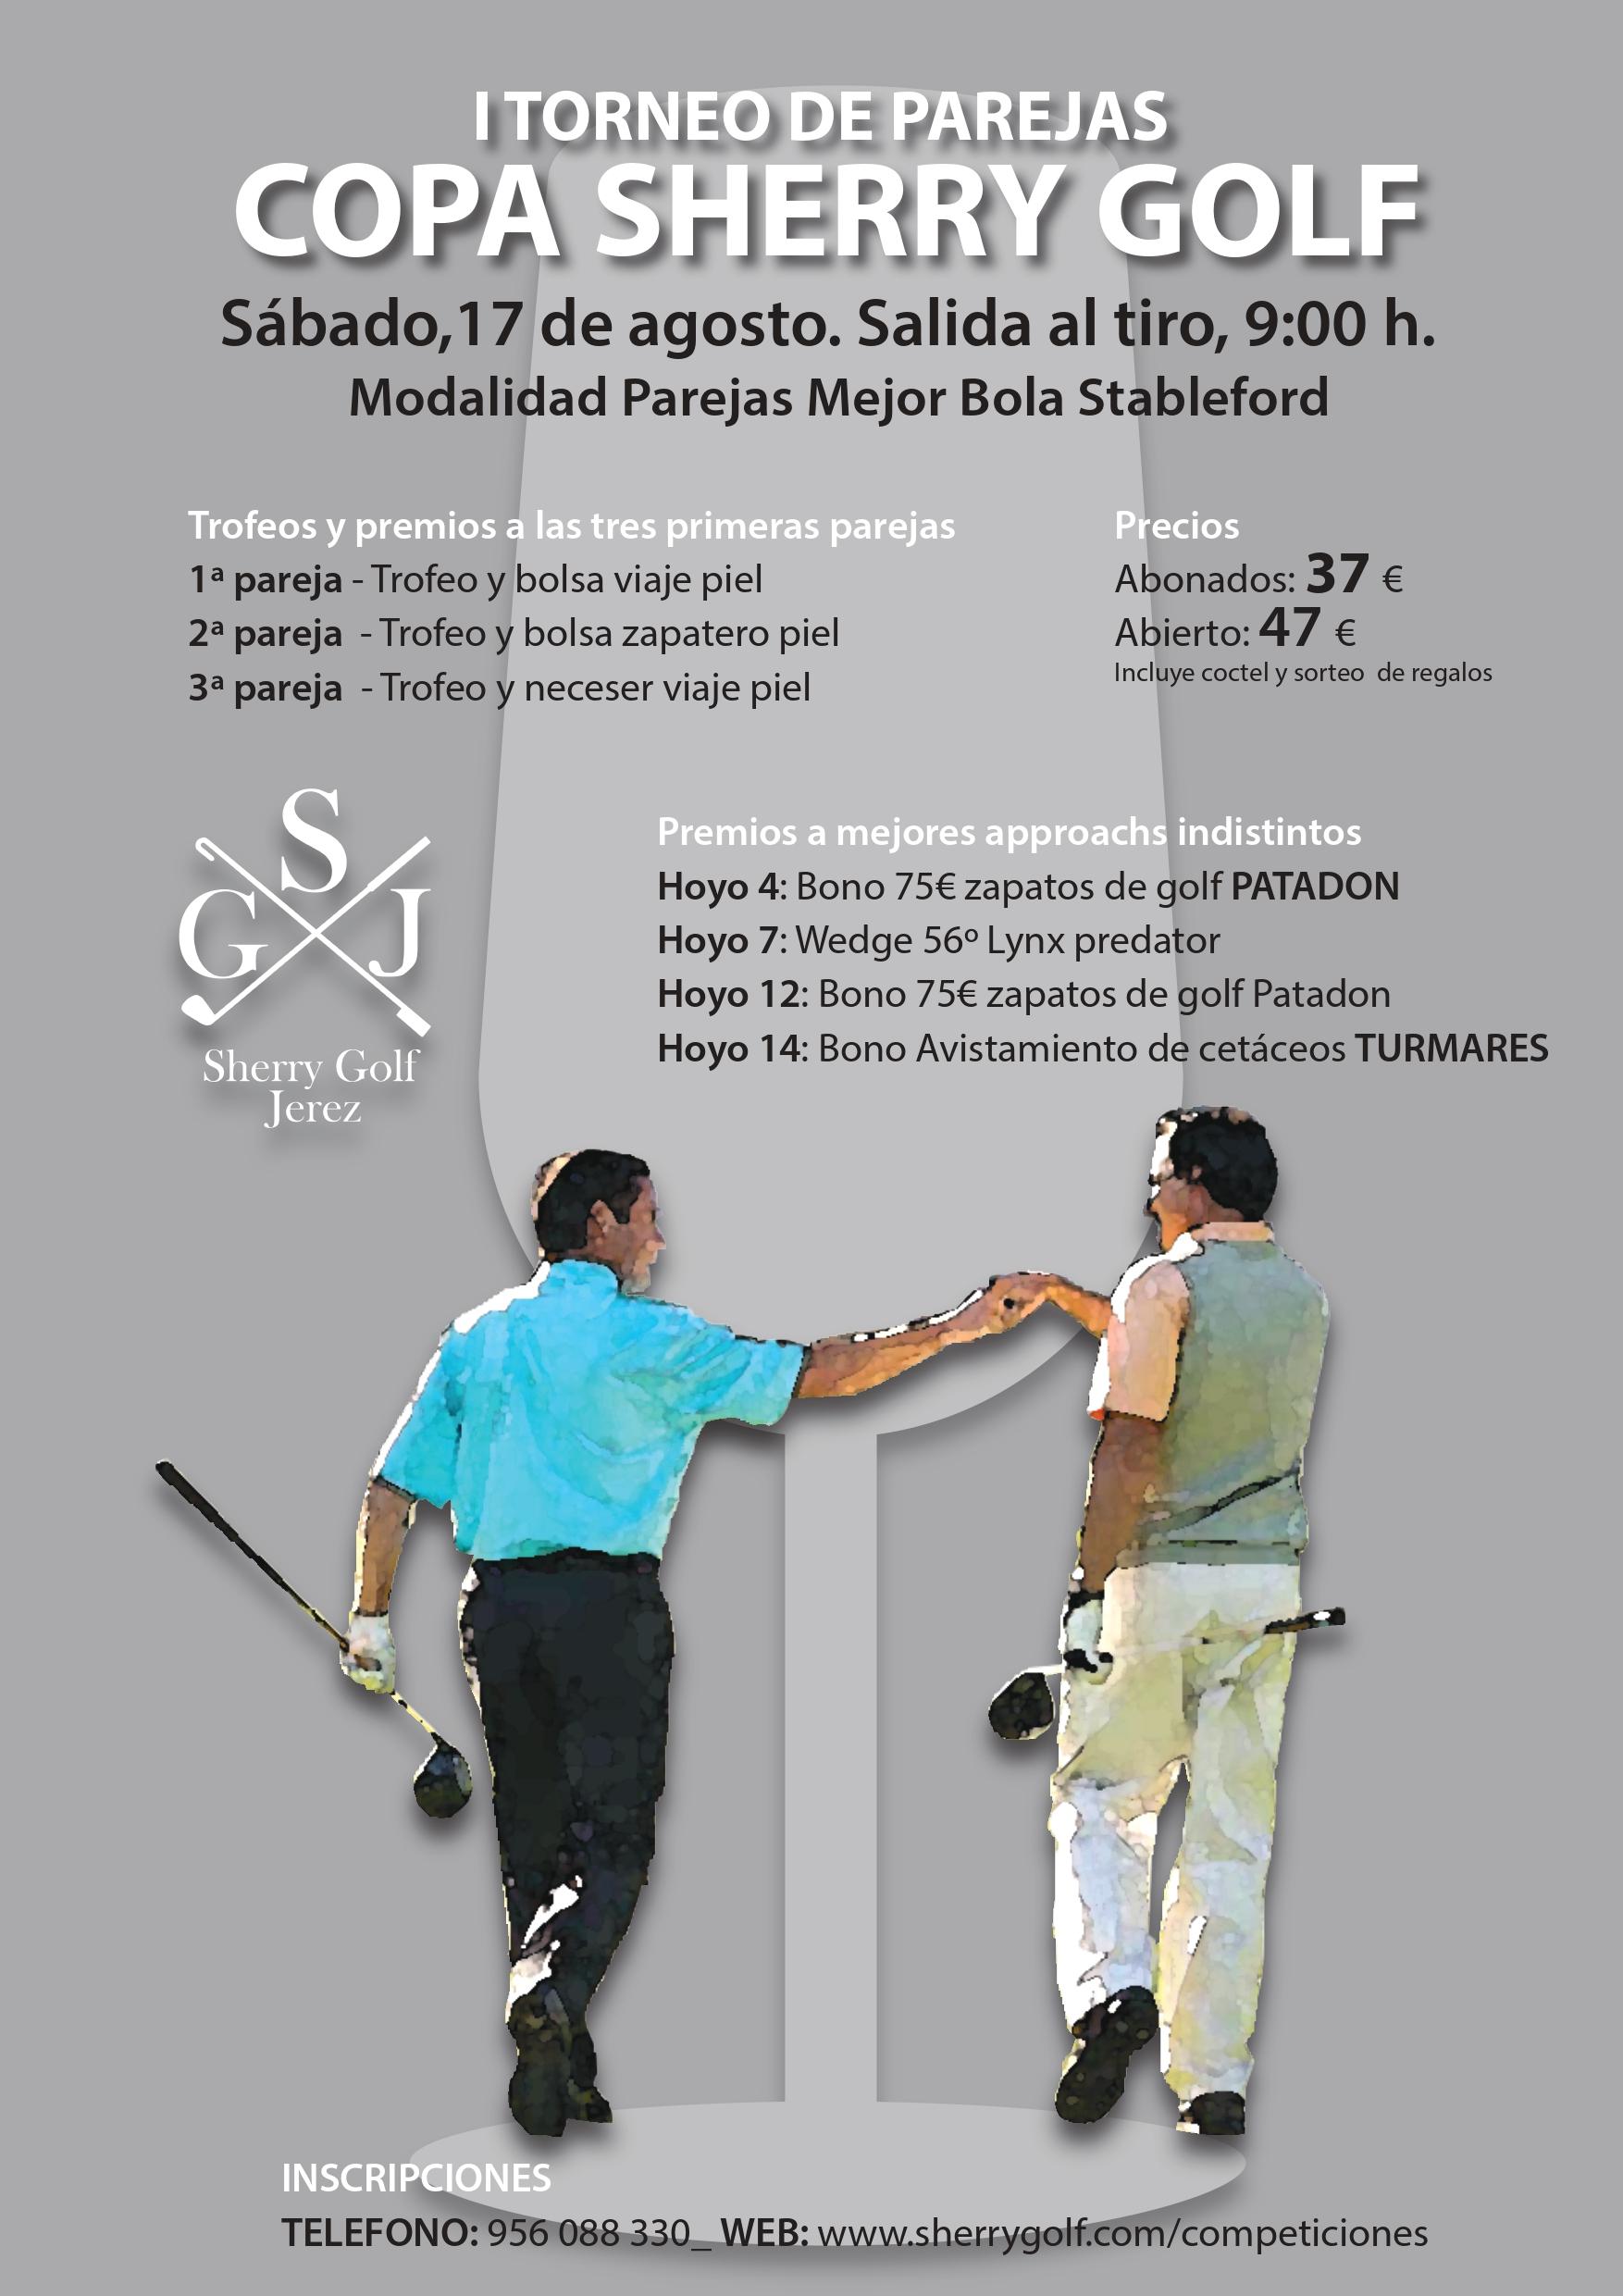 Conocer Gente Jerez Amplia - 385880